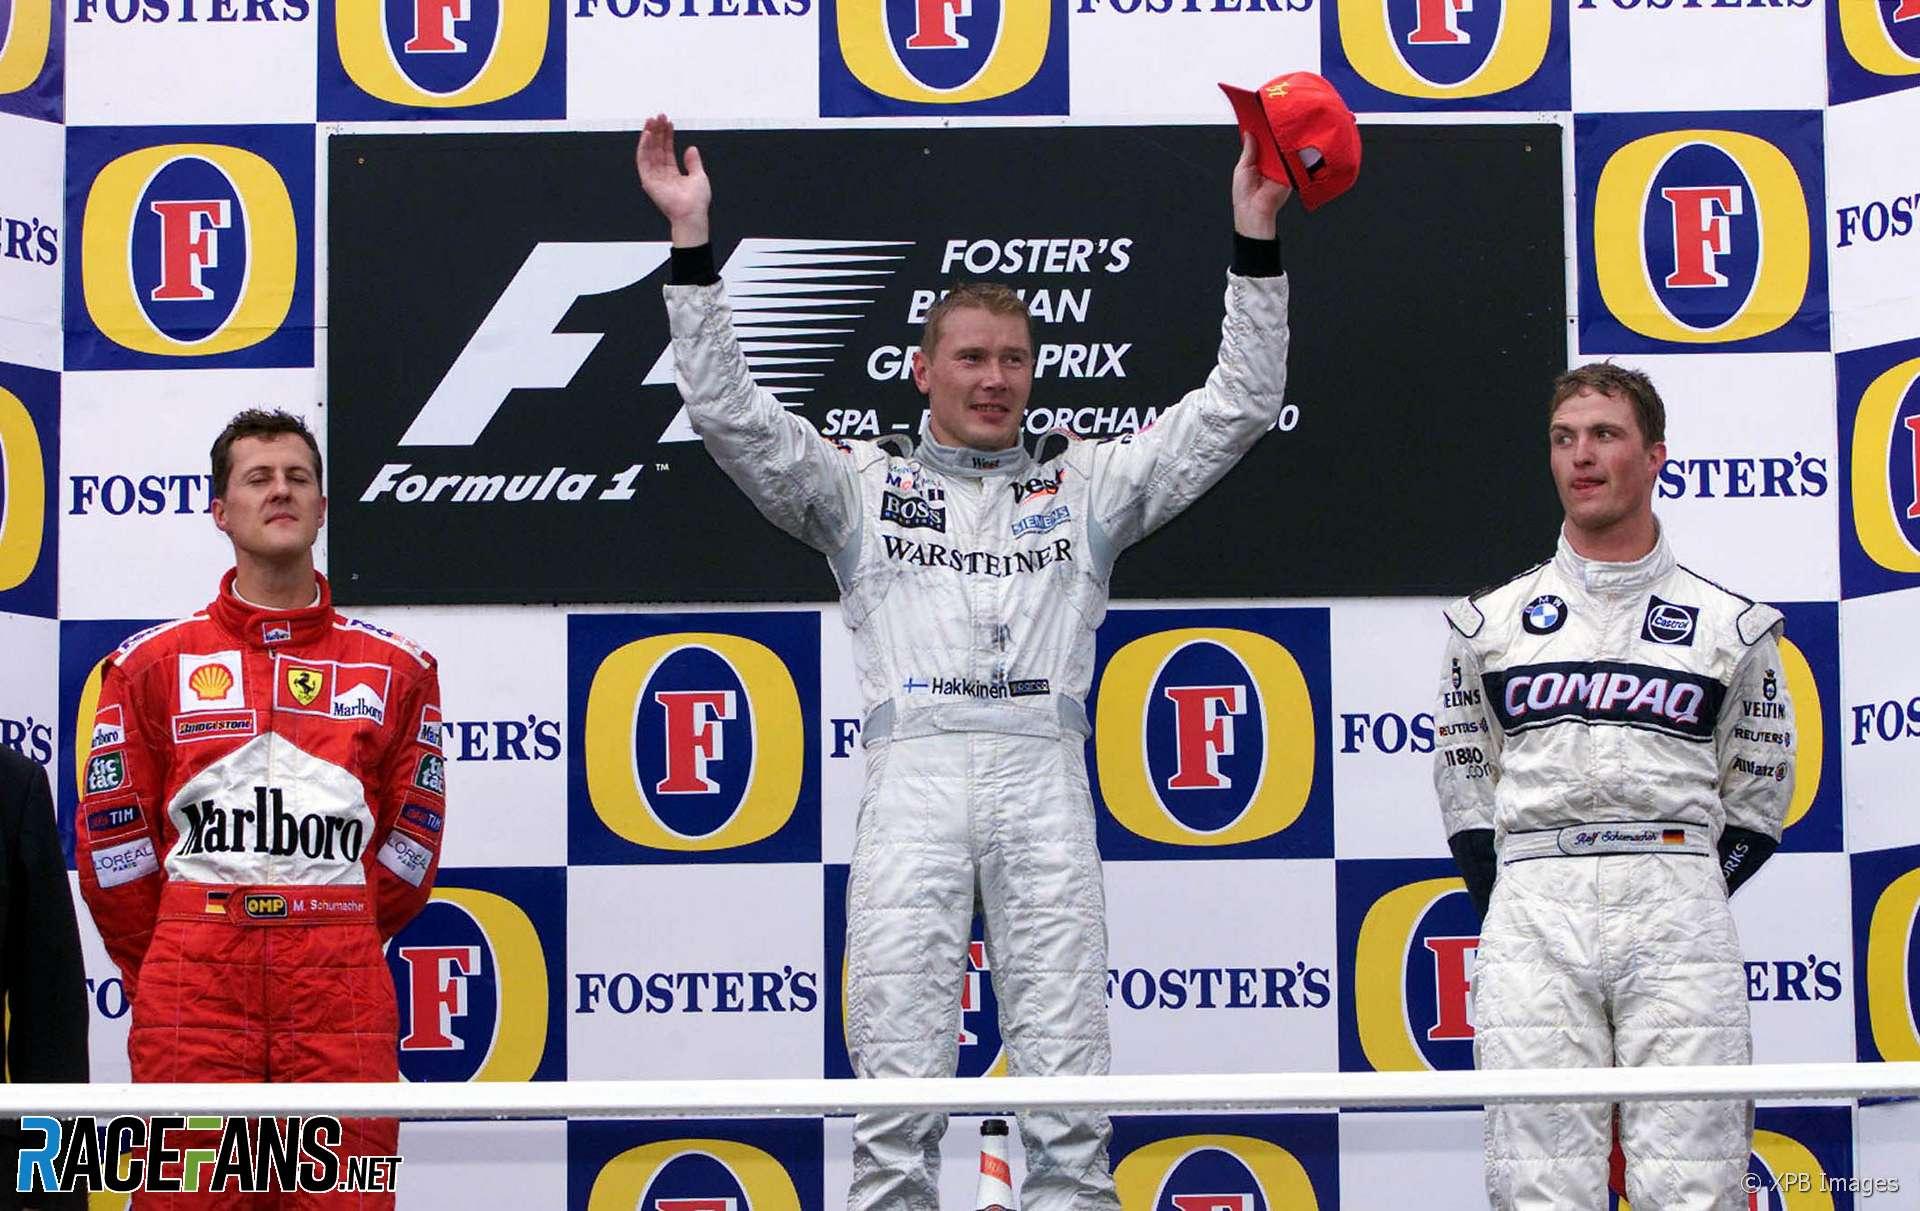 Mika Hakkinen, Michael Schumacher, David Coulthard, Spa-Francorchamps, 2000